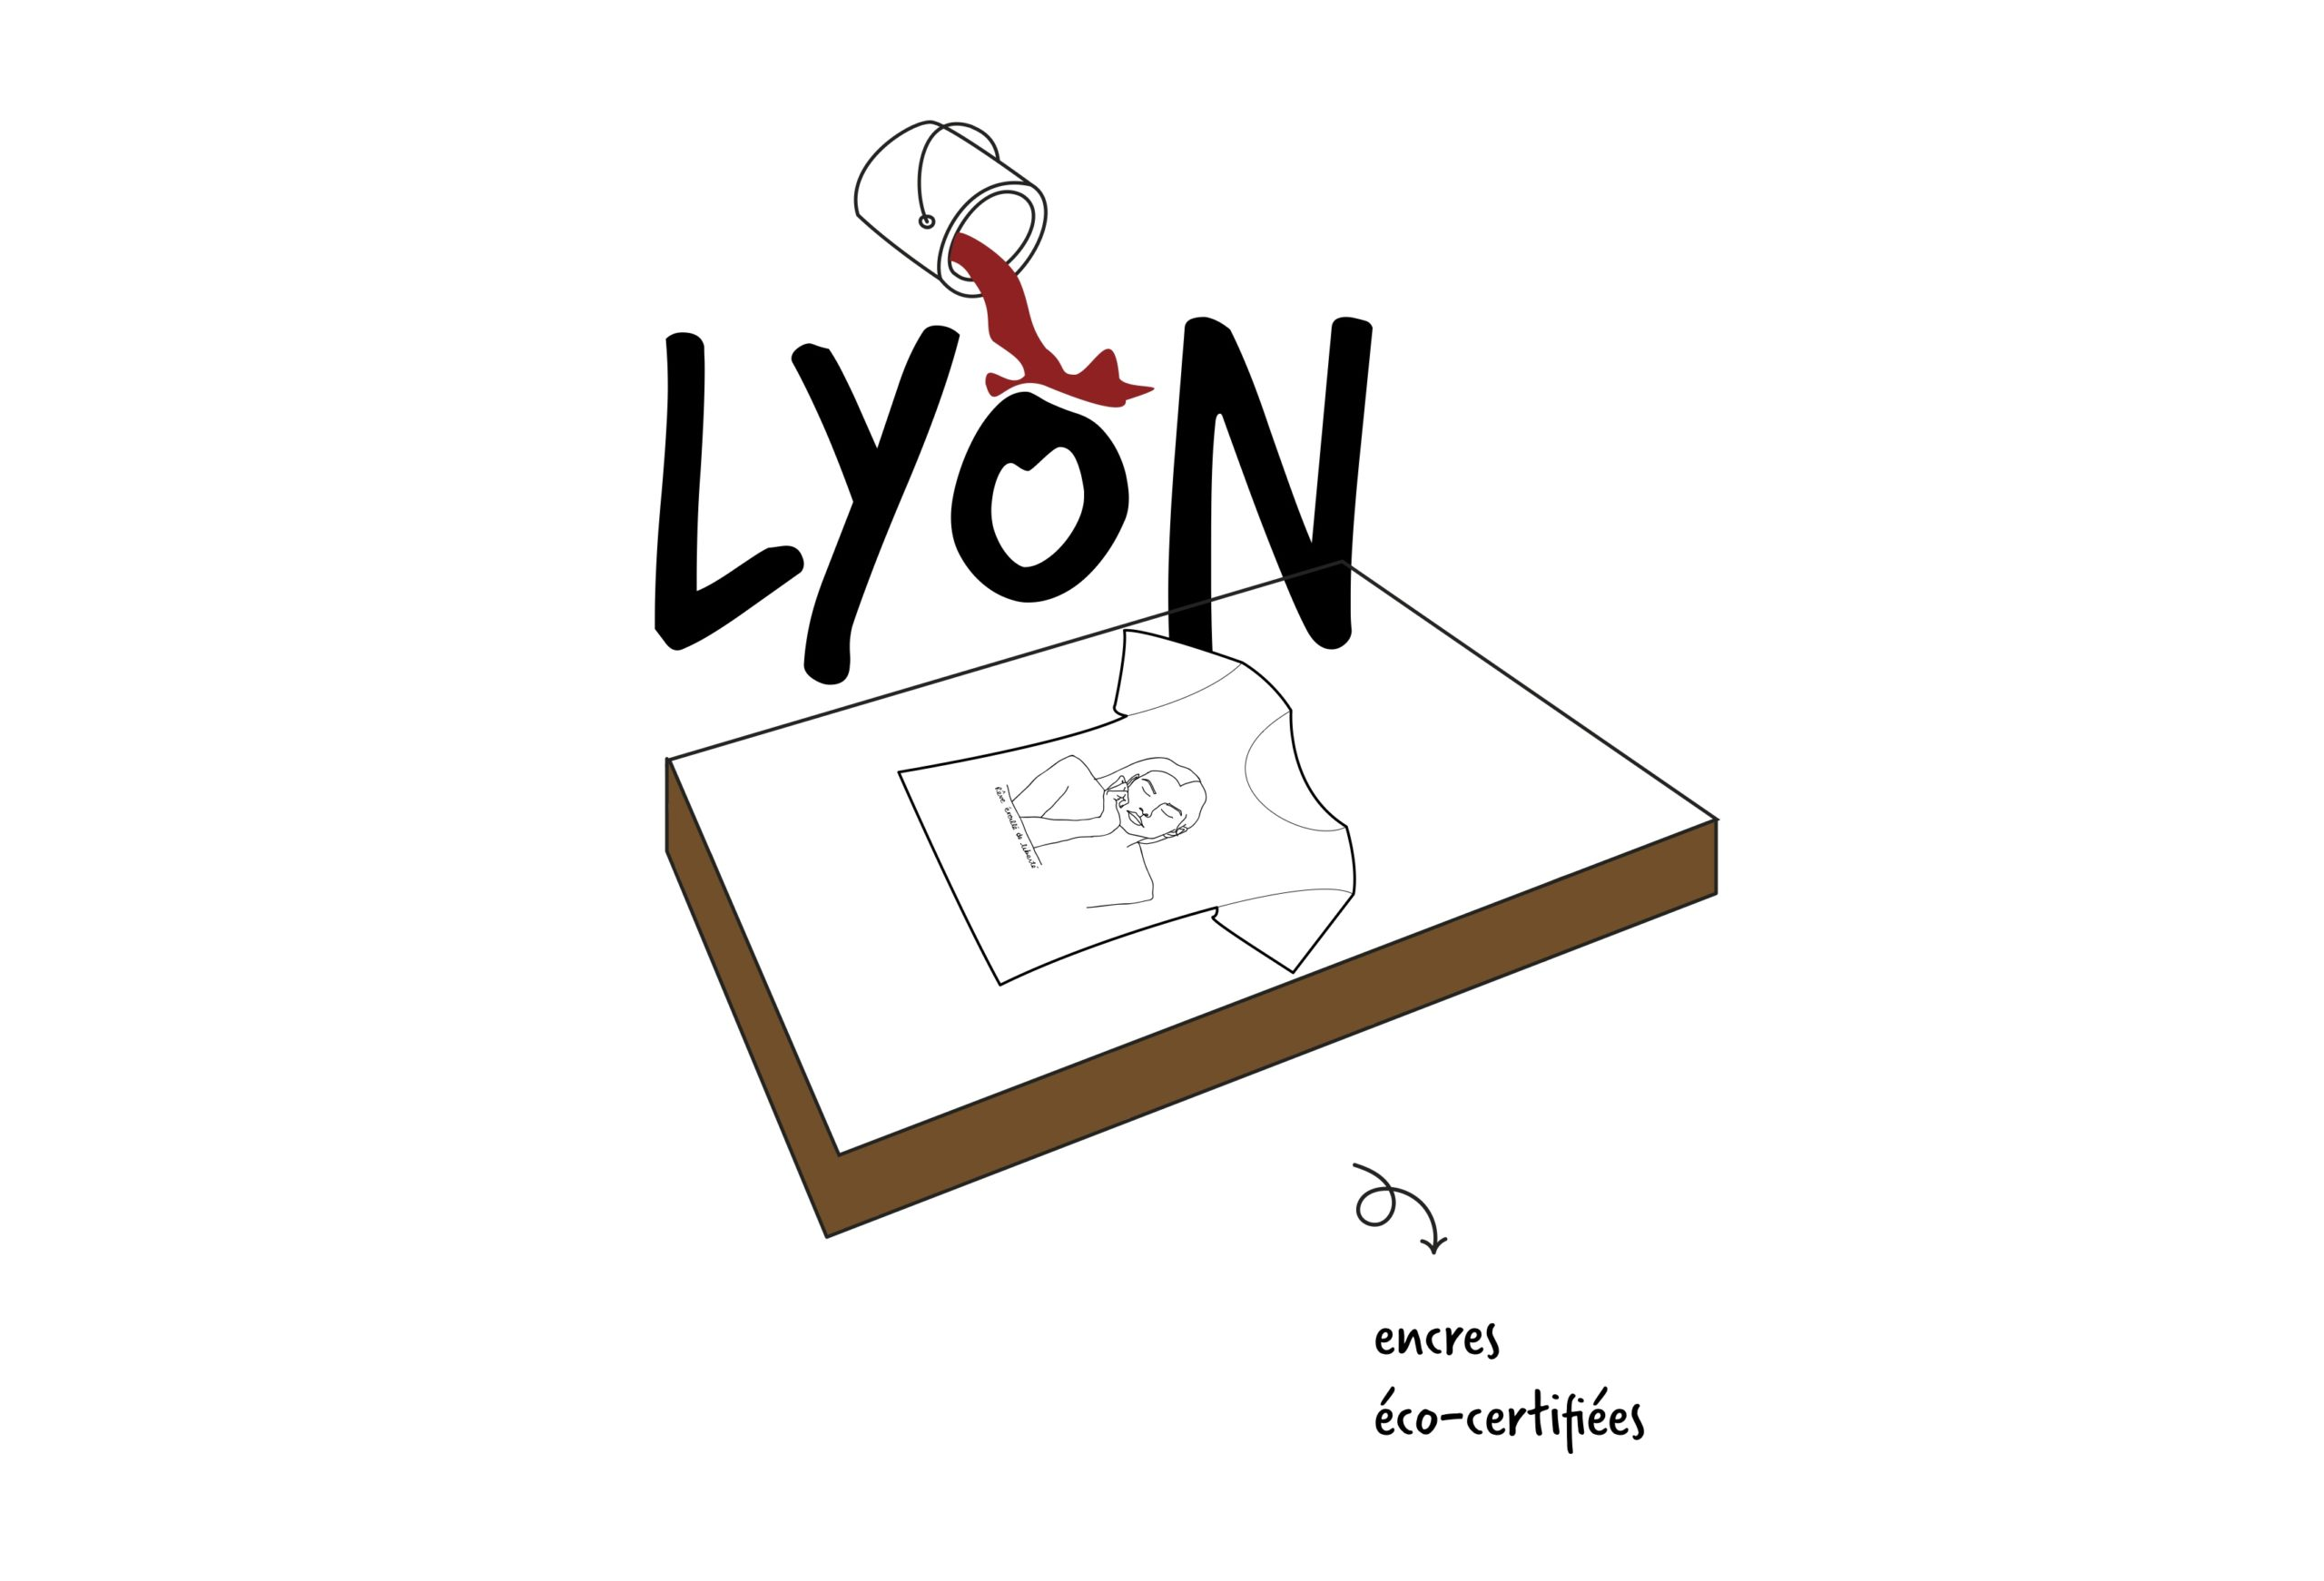 Illustration de l'impression d'un t-shirt Leonor Roversi à Lyon